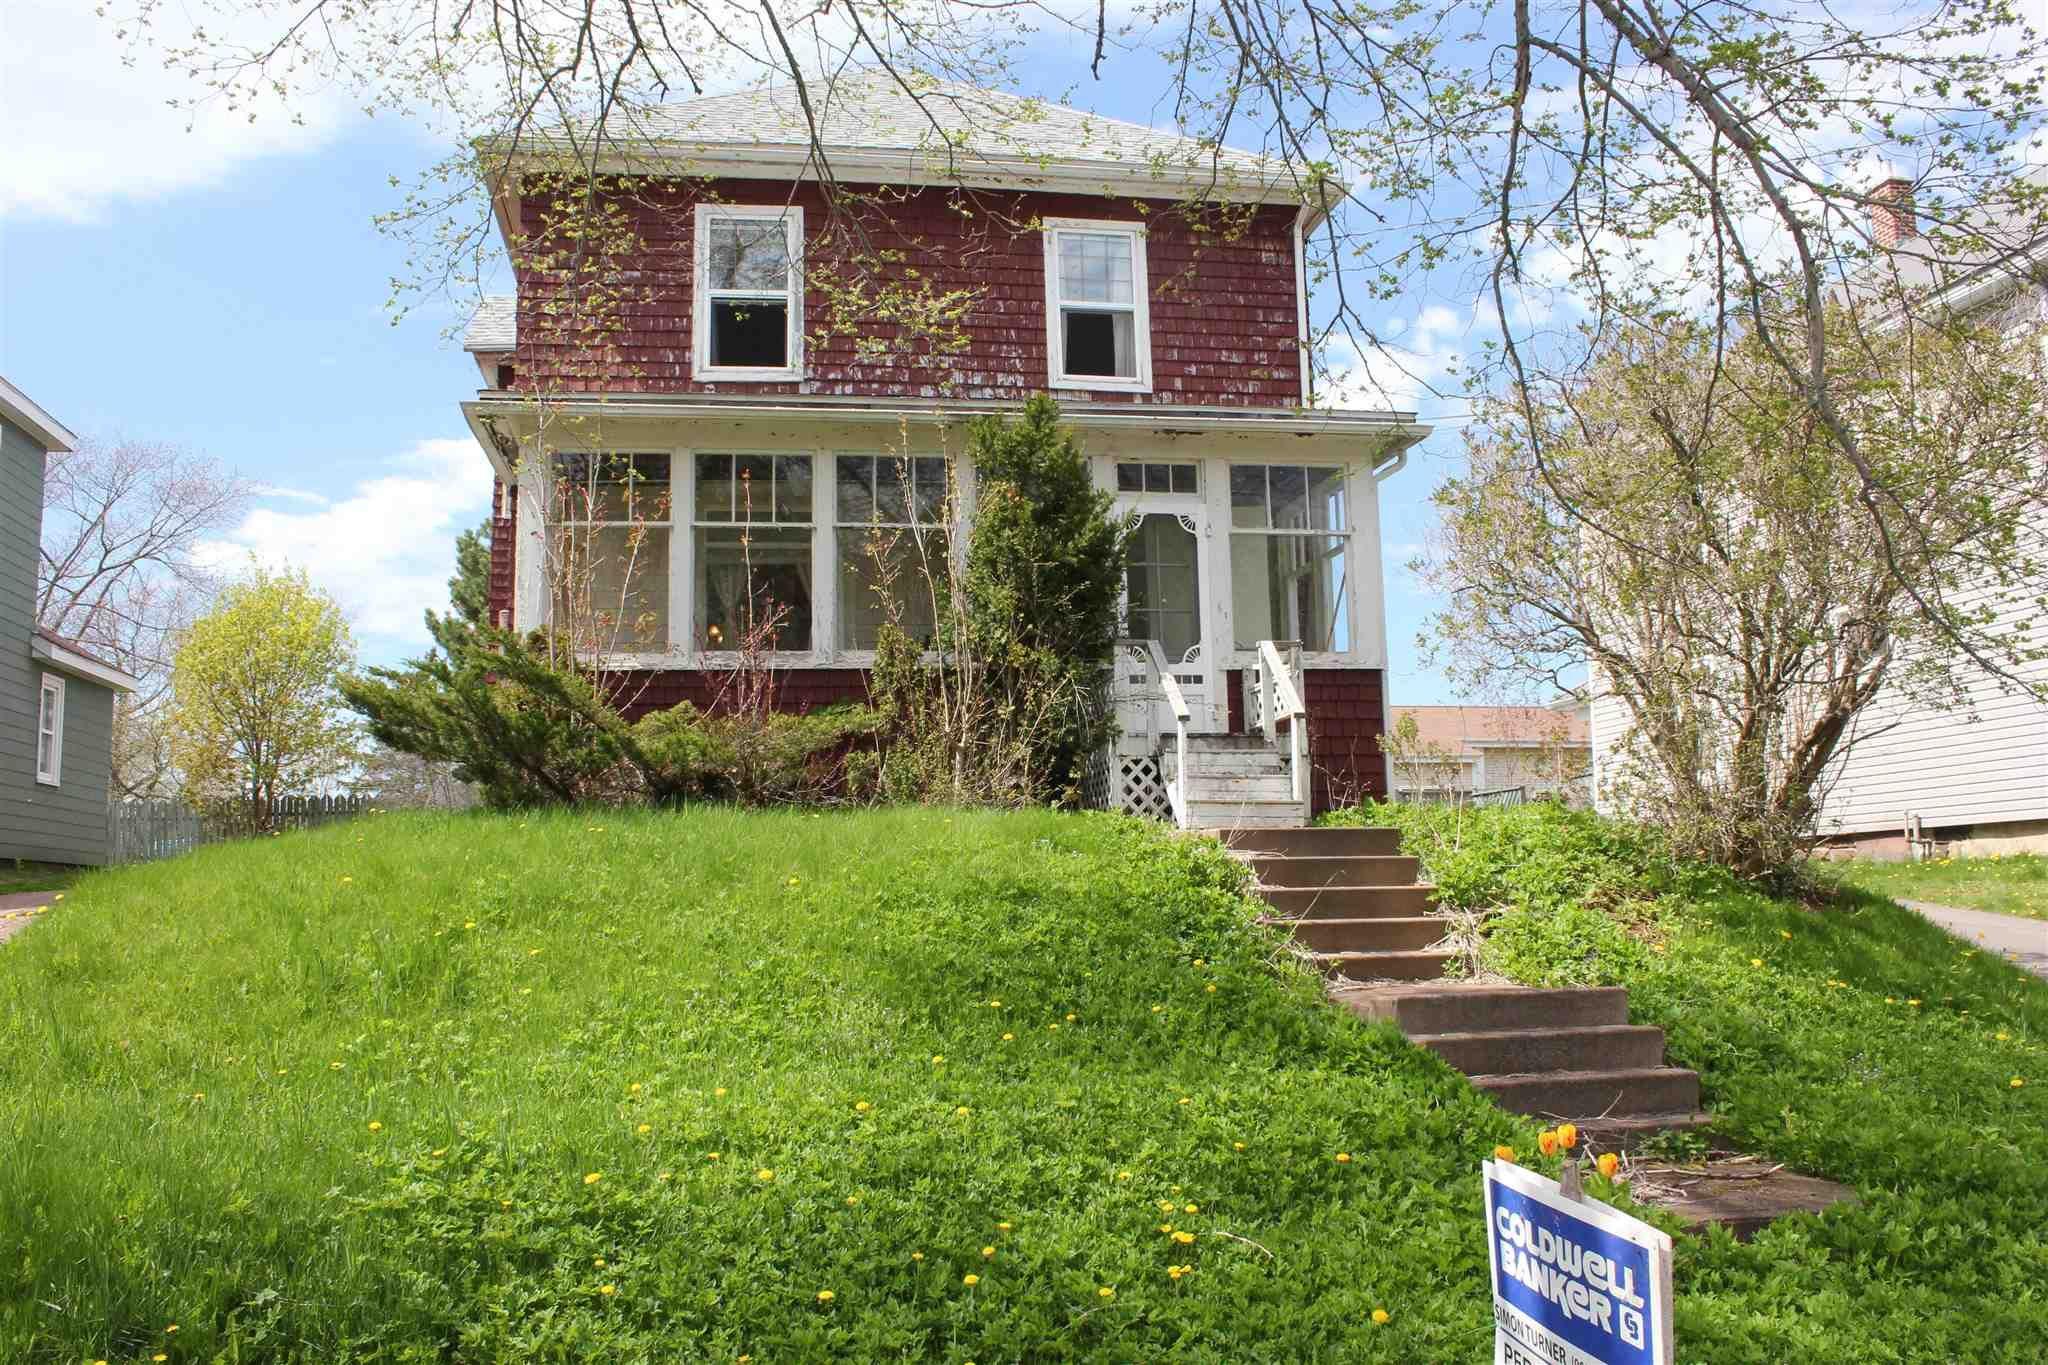 Main Photo: 12 Harding Avenue in Amherst: 101-Amherst,Brookdale,Warren Residential for sale (Northern Region)  : MLS®# 202112038